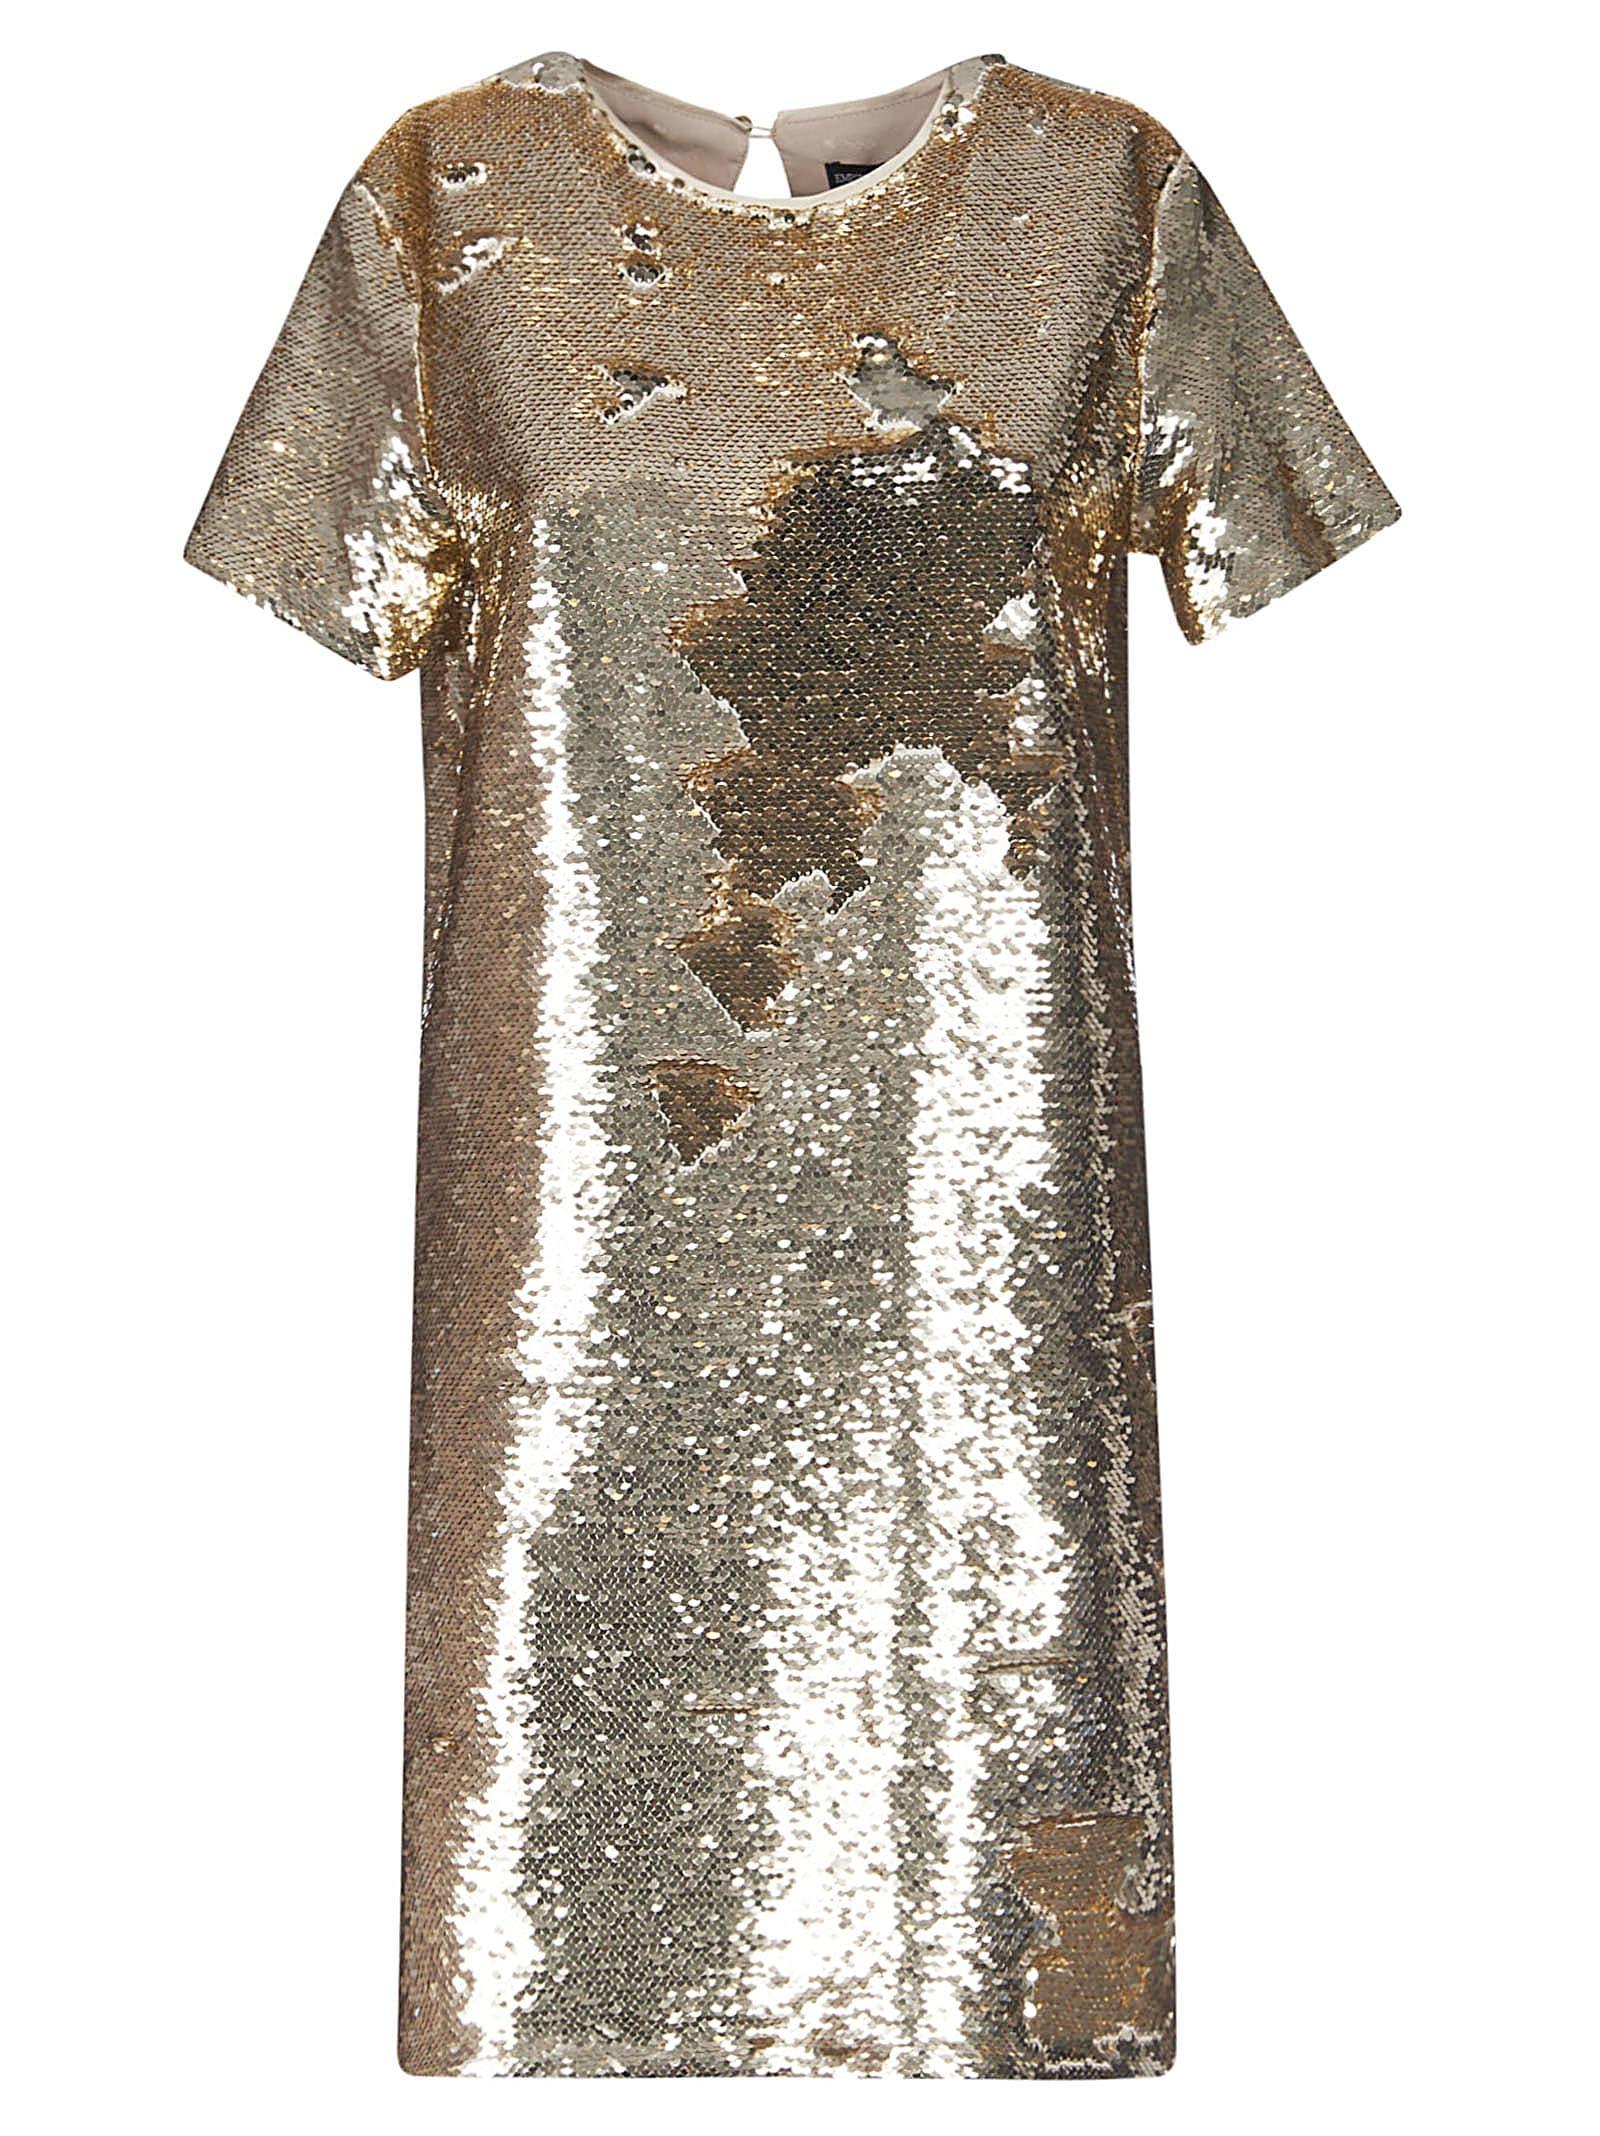 Buy Giorgio Armani Embellished Dress online, shop Giorgio Armani with free shipping